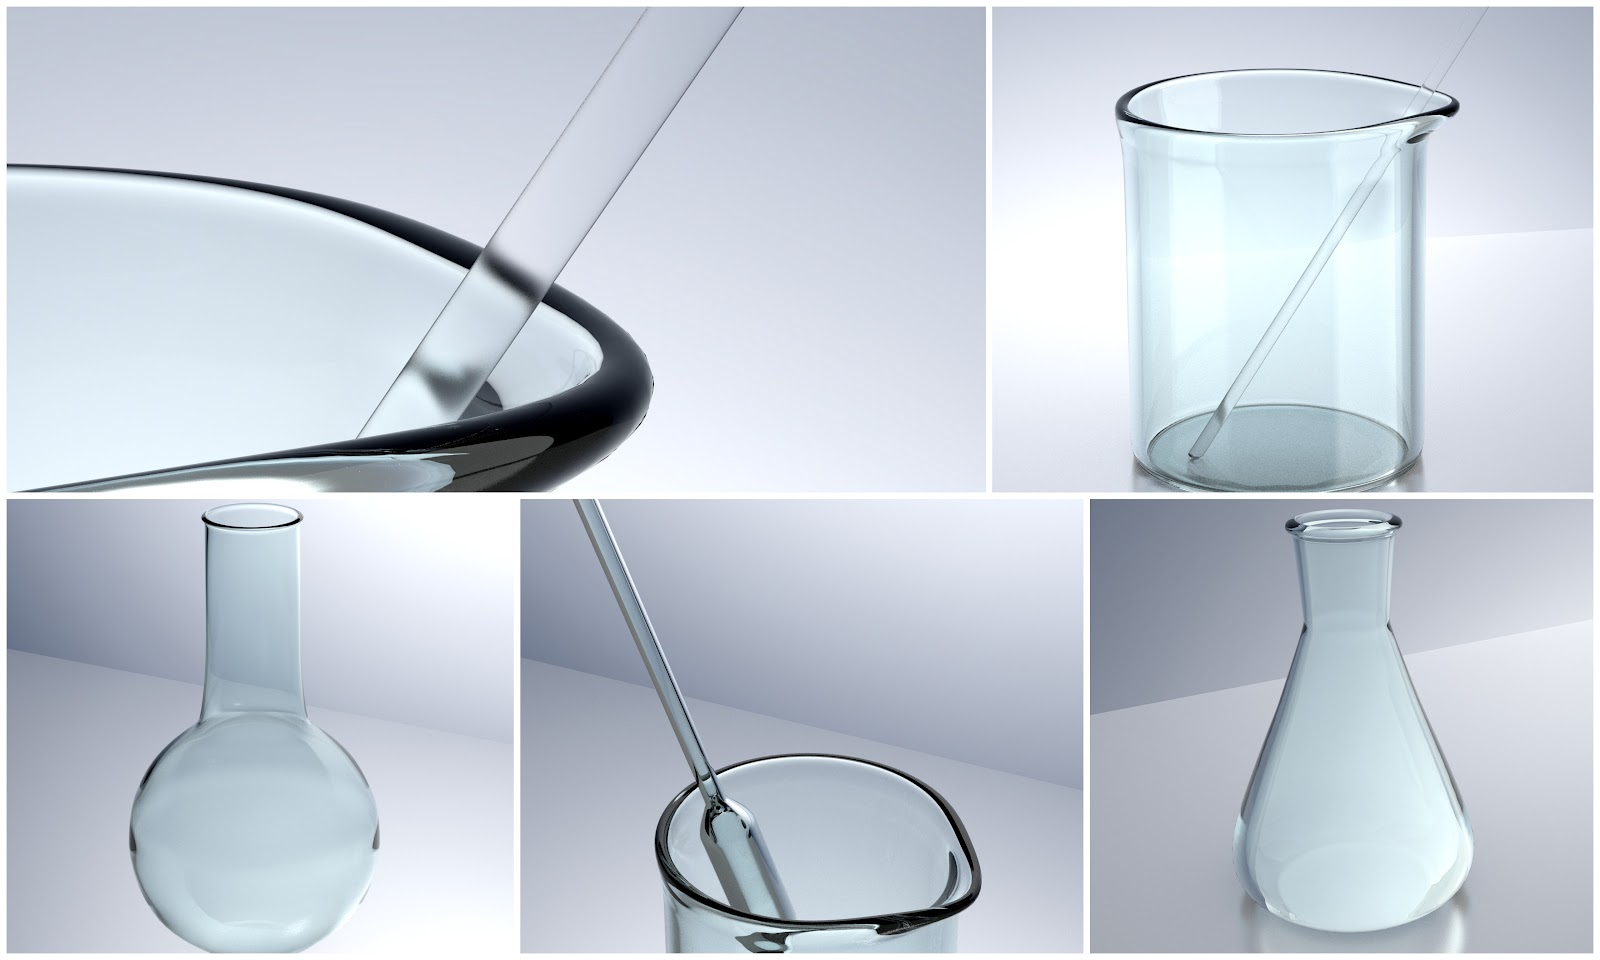 Blender@Project OSCAR | IIT Bombay: Chemistry Lab ...